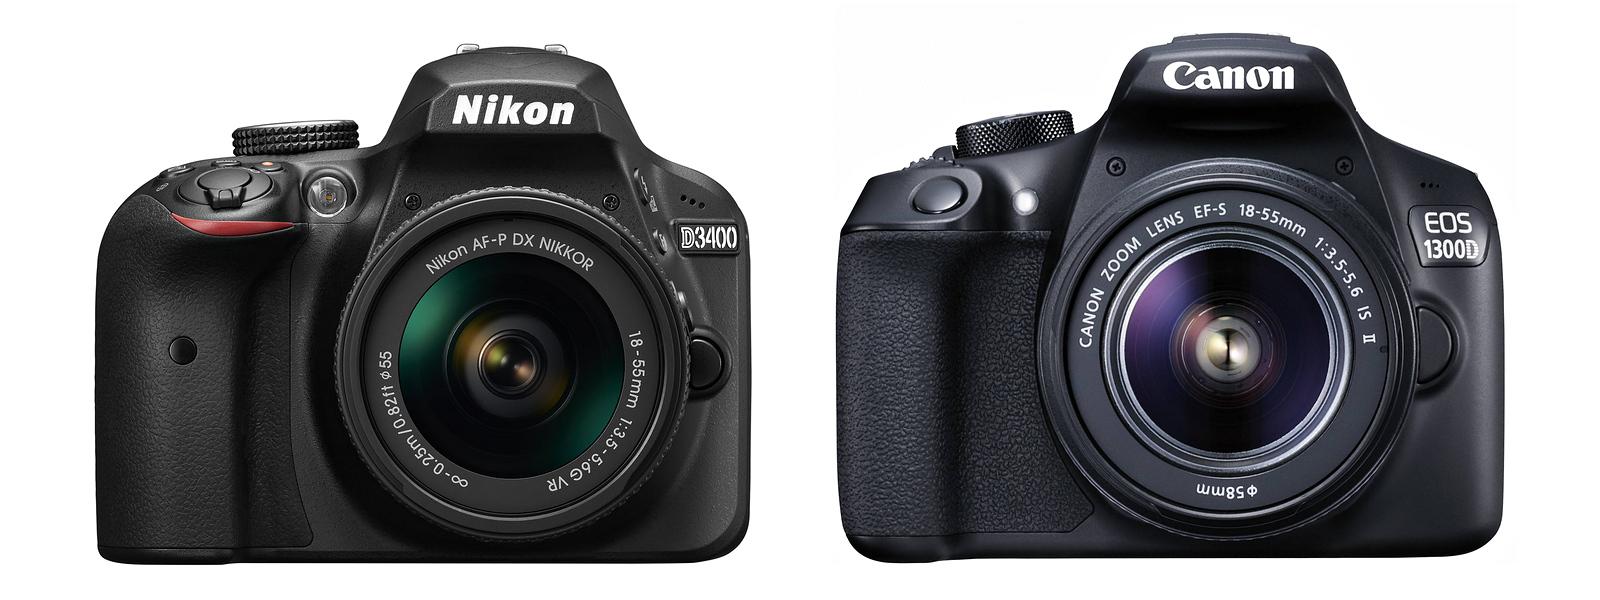 Сравнение Nikon D3400 и Canon EOS 1300D